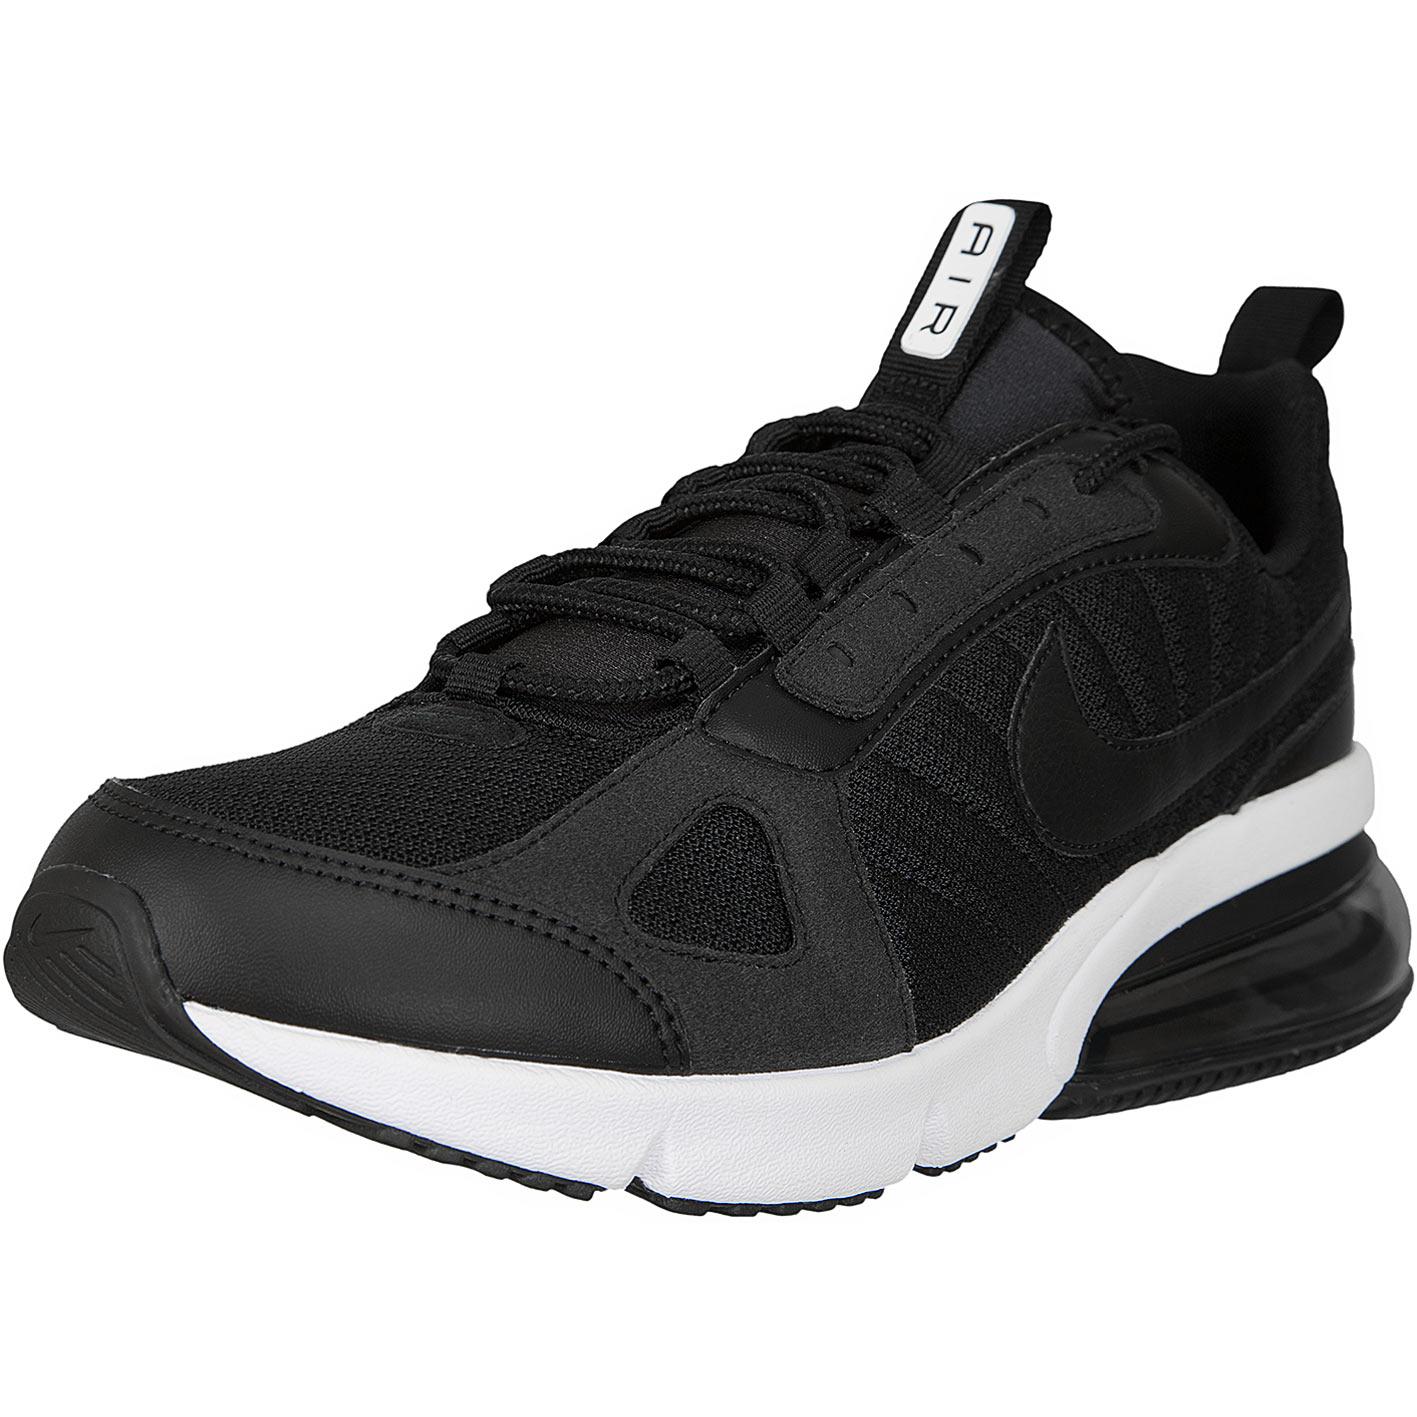 Nike Sneaker Air Max 270 Futura schwarzweiß